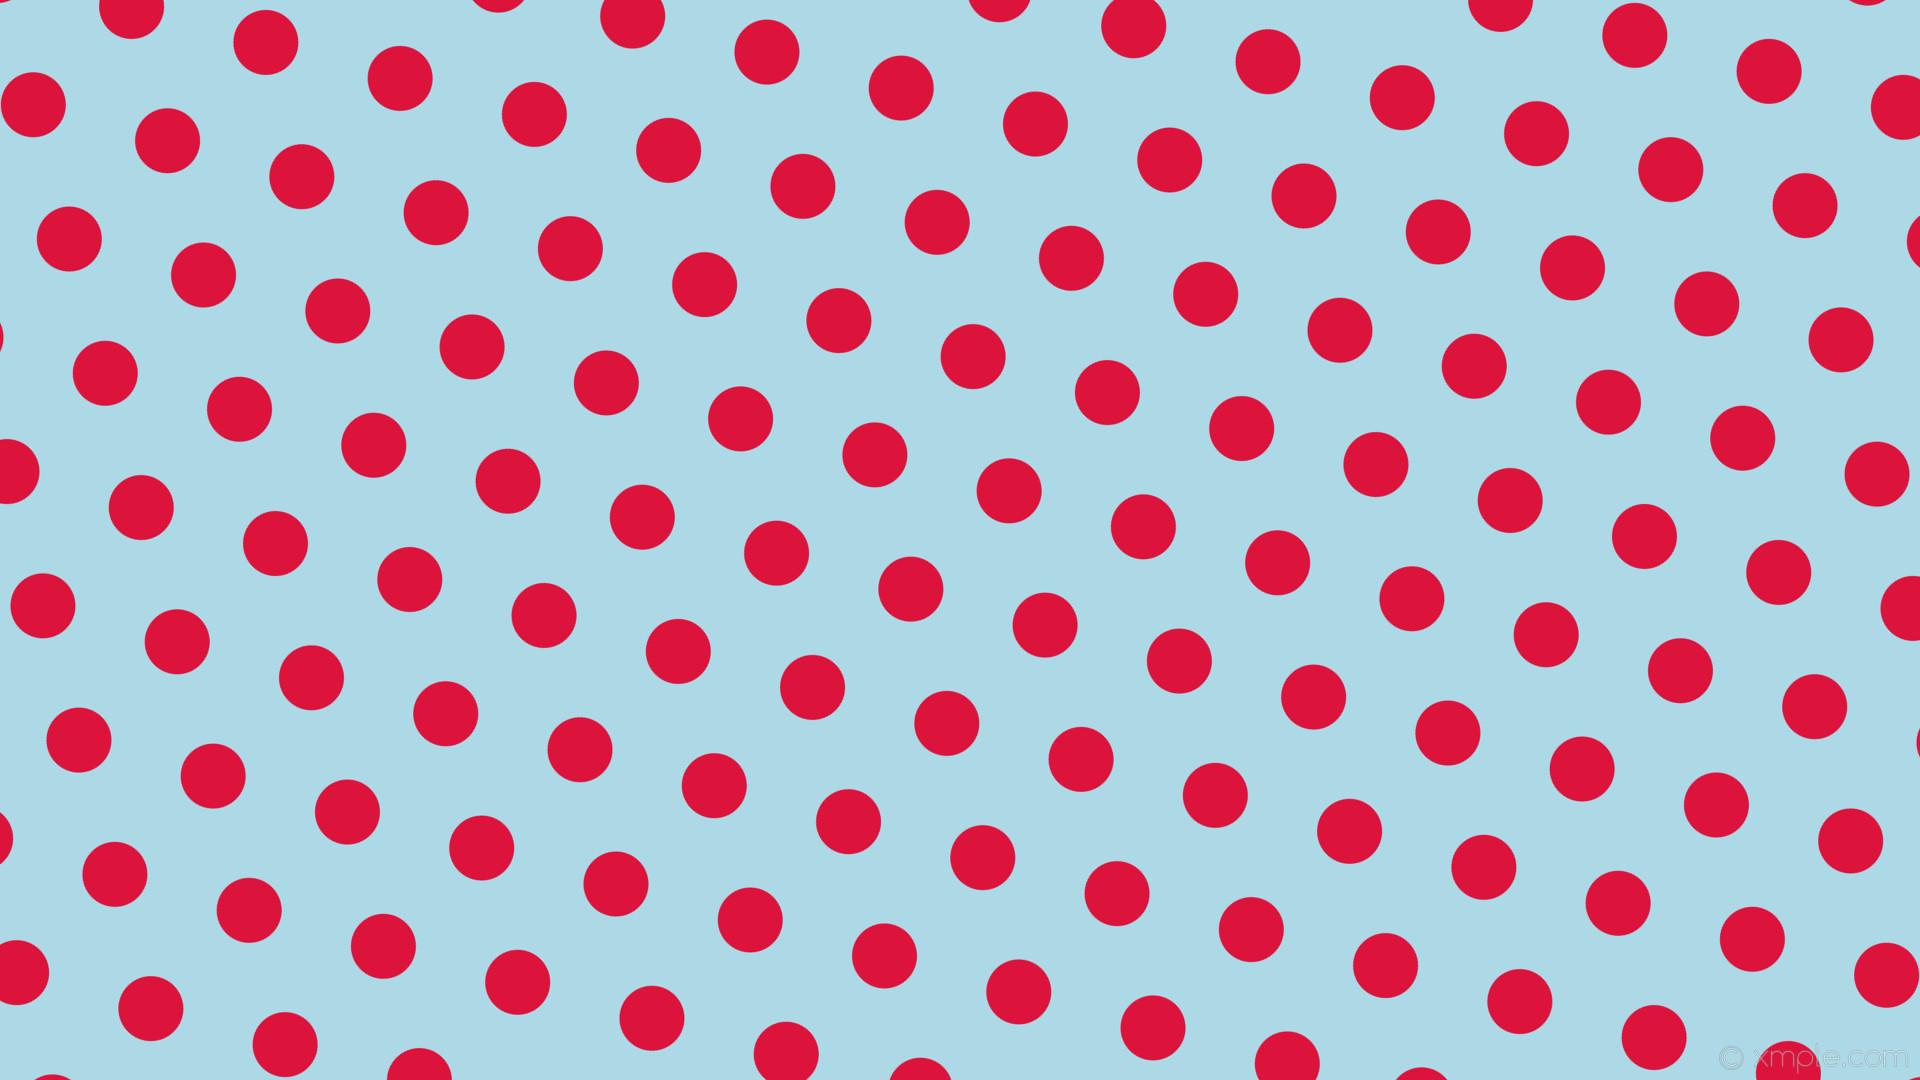 wallpaper red blue hexagon polka dots light blue crimson #add8e6 #dc143c  diagonal 45°